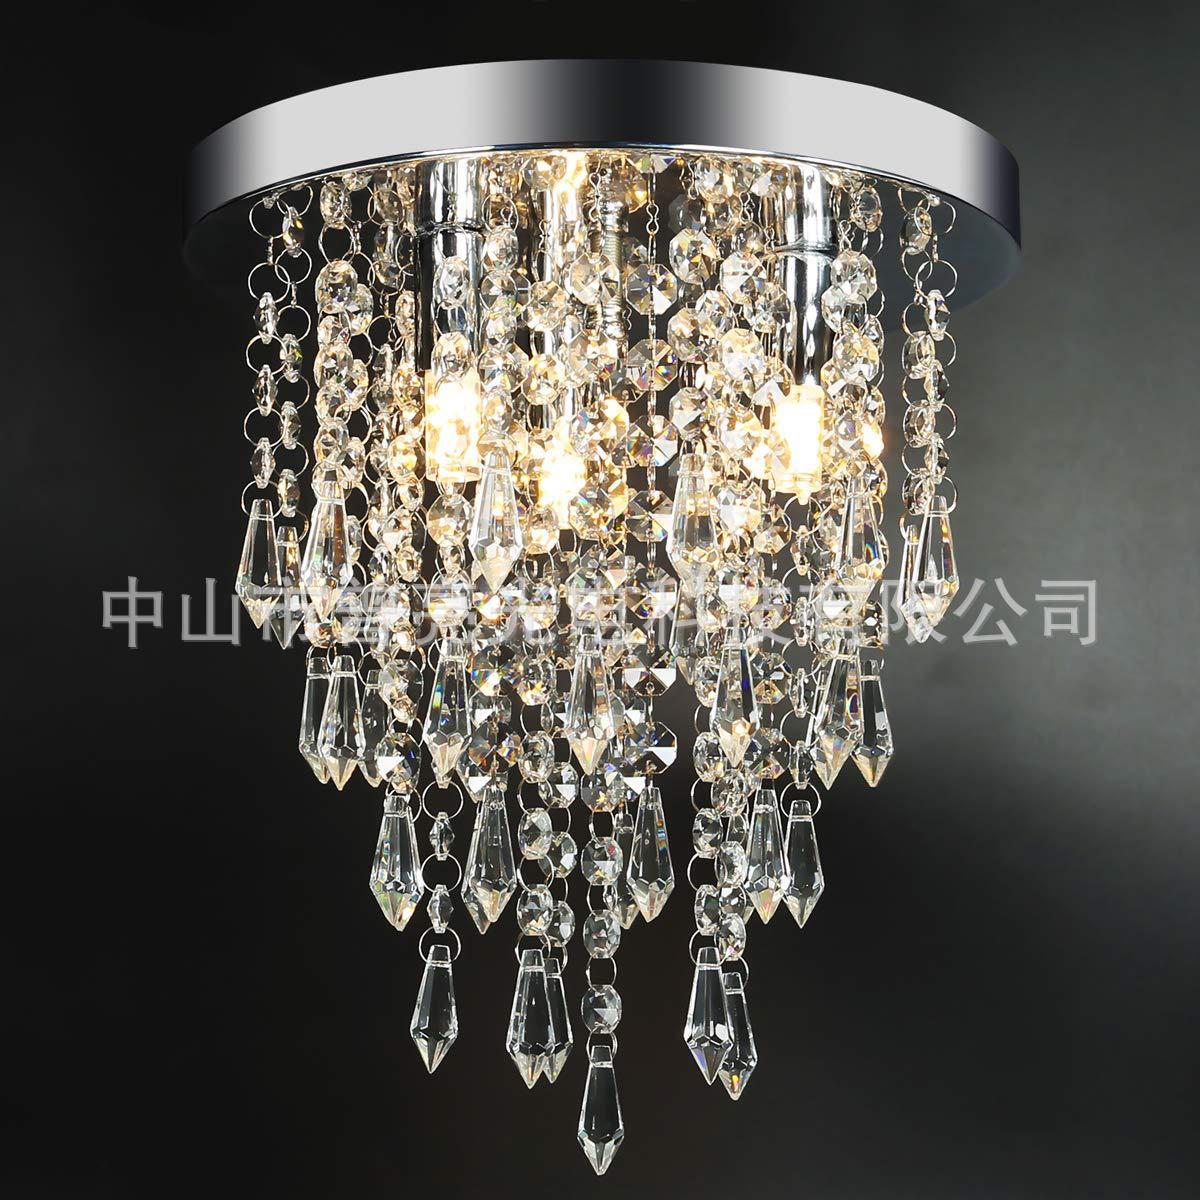 Modern Crystal Ceiling Lamp Aisle Lights Corridor Lights Entrance Lights Simple LED Crystal Pendant Lamp Manufacturers Direct Se